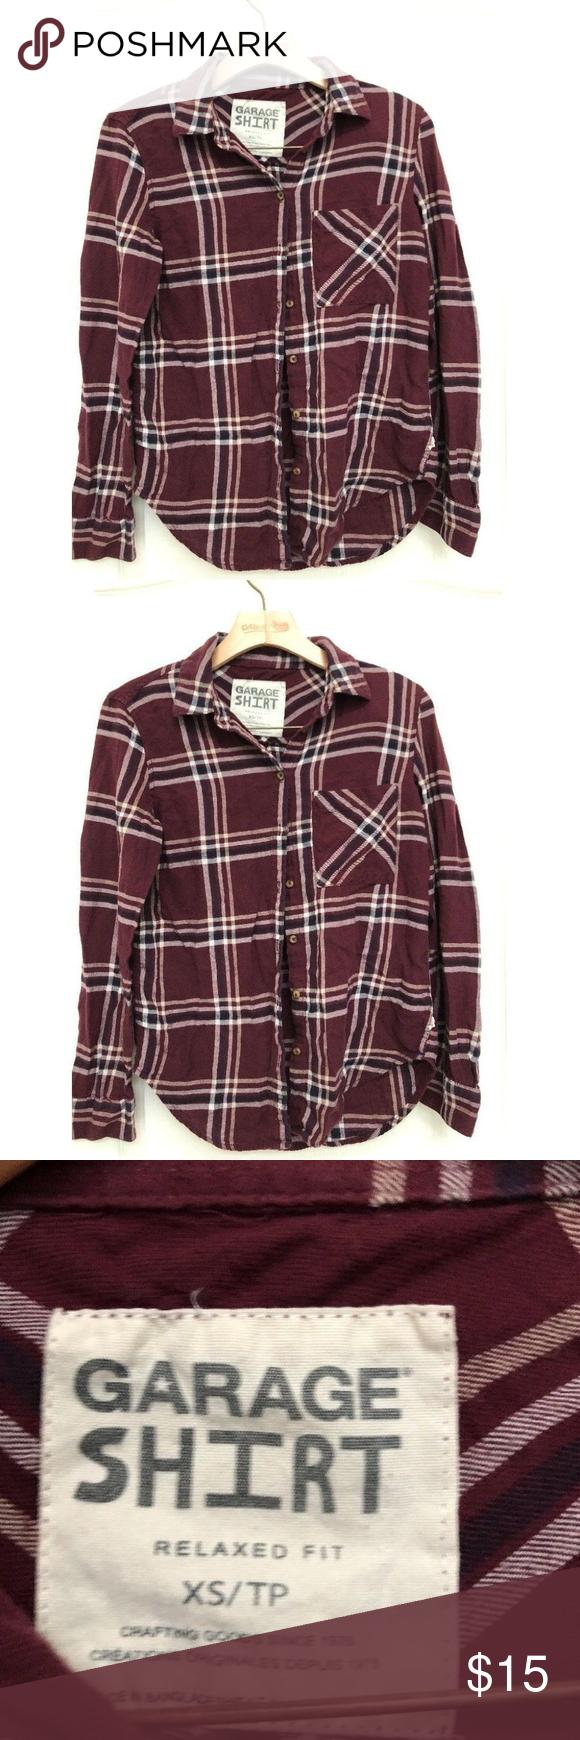 Flannel shirt xs  Garage Women Soft Plaid Lumberjack Blouse Shirt XS  My Posh Closet